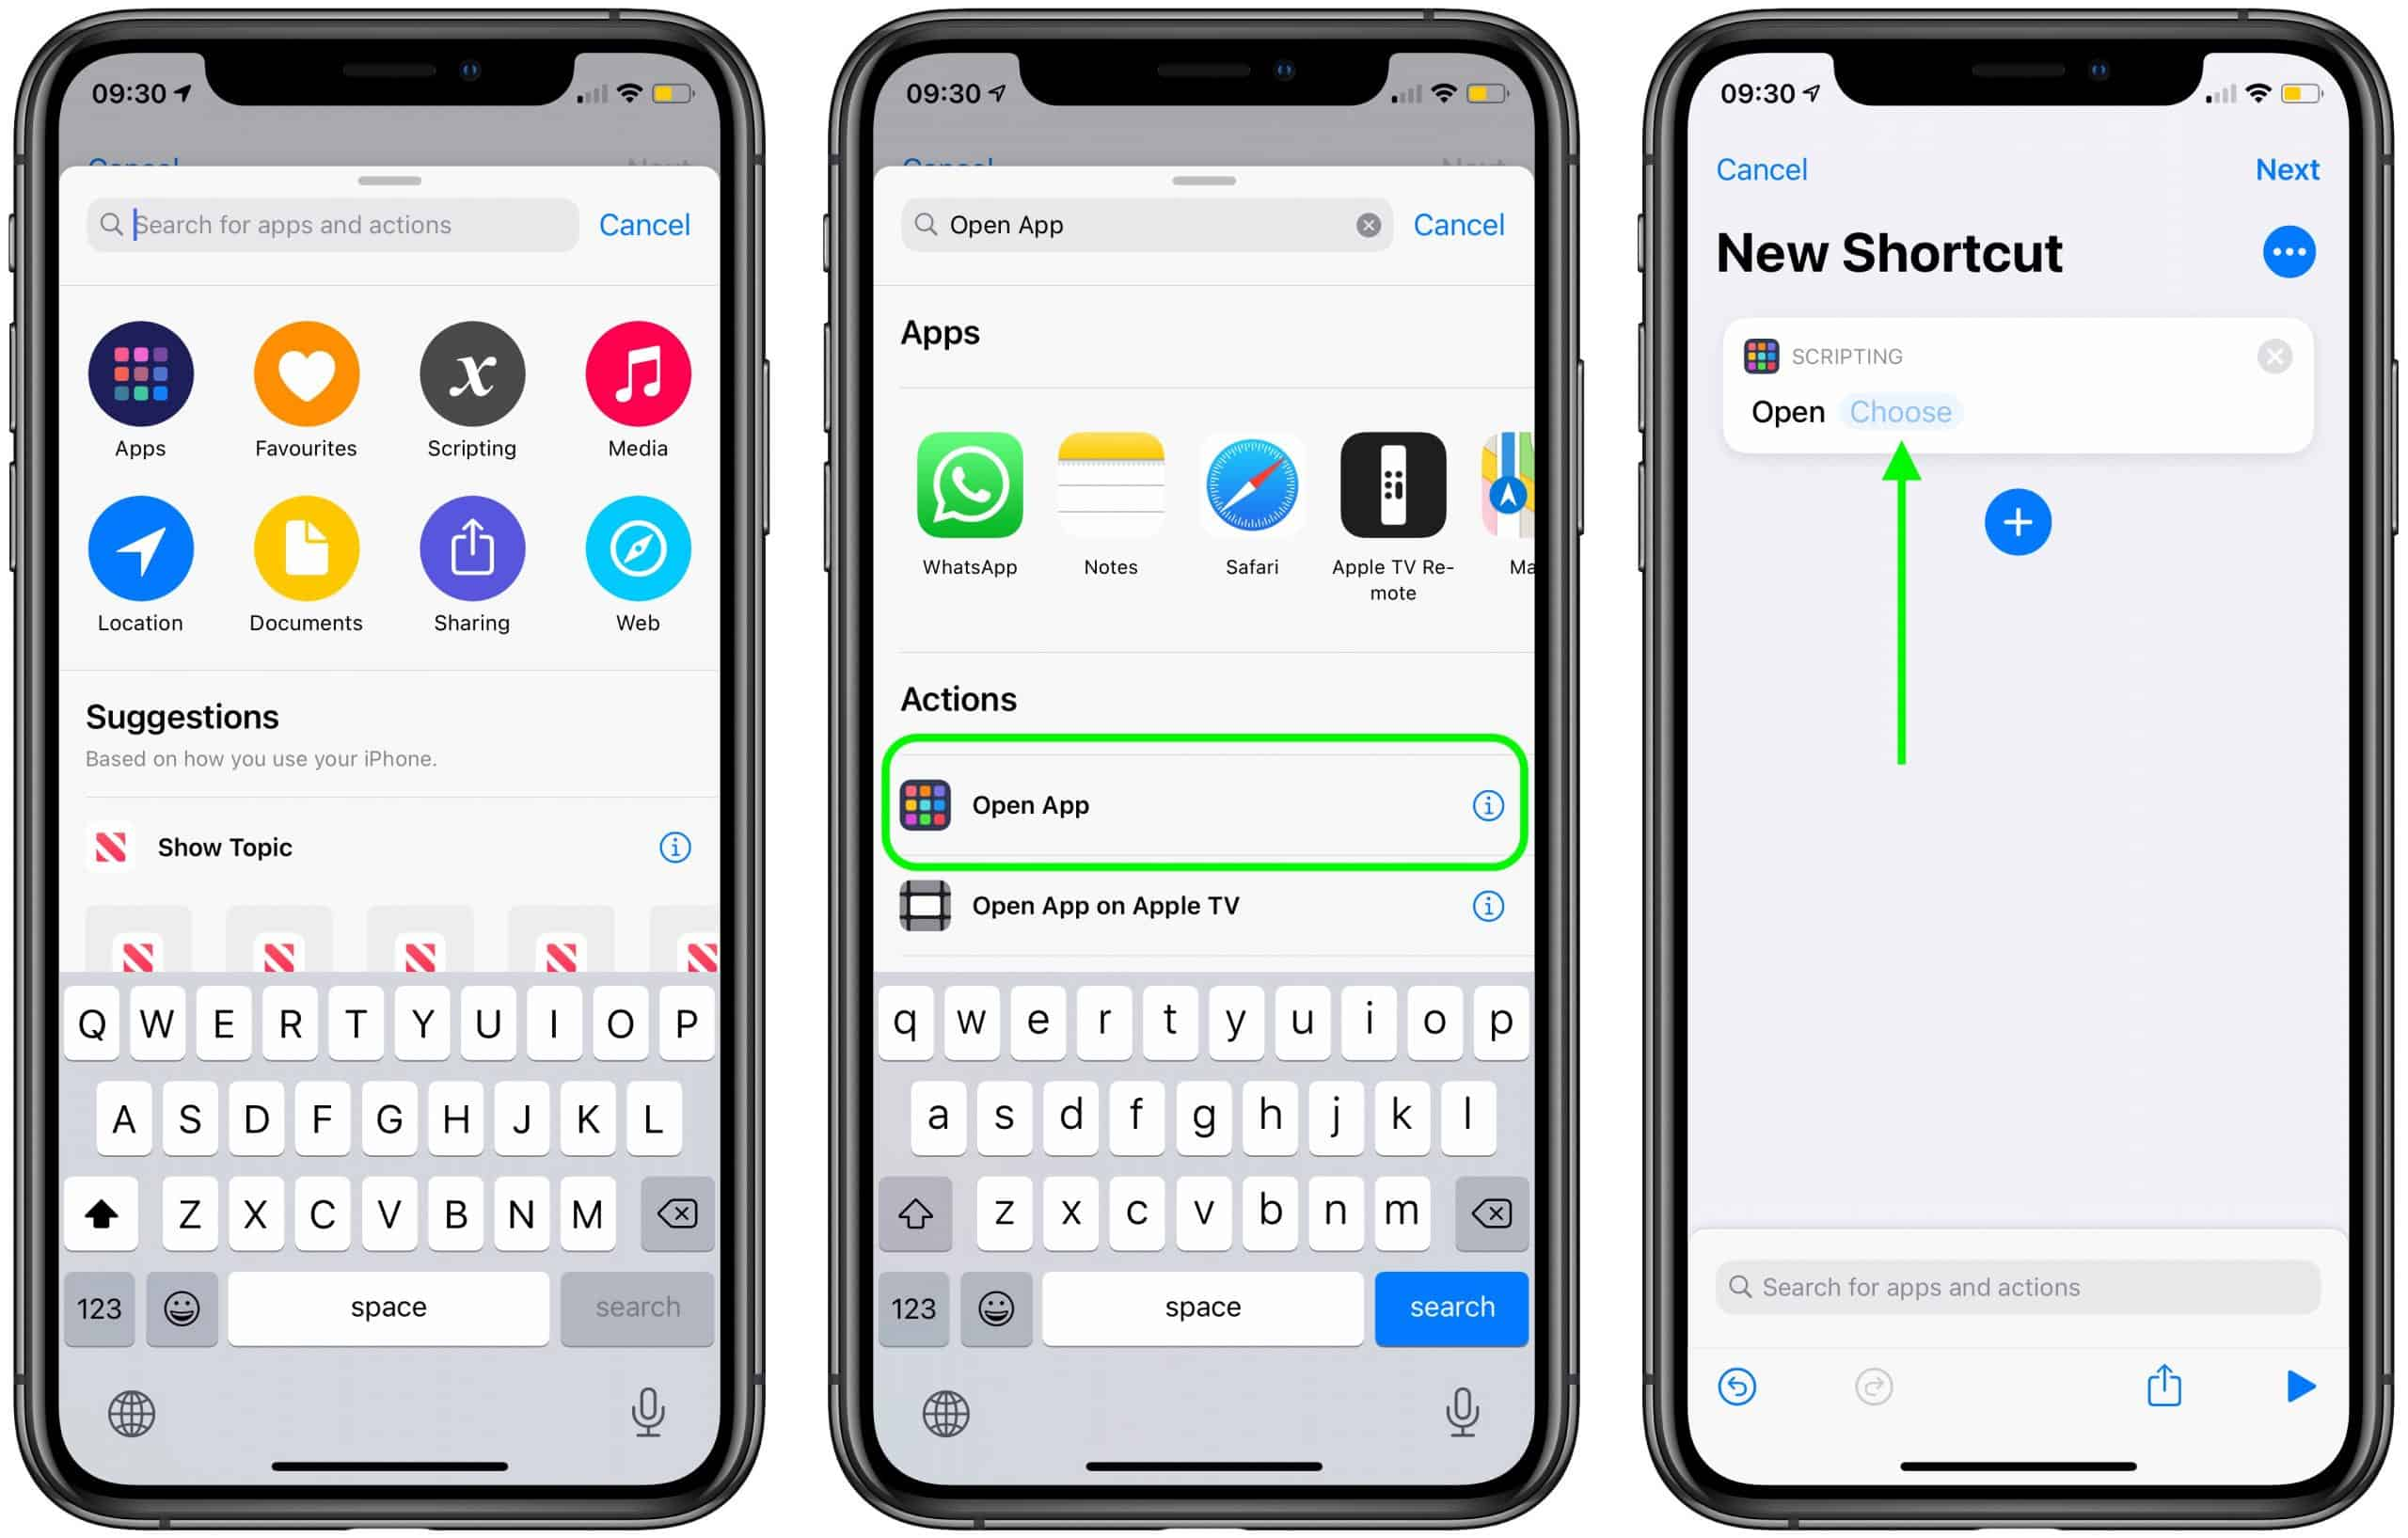 Customize App Icons On iOS 14